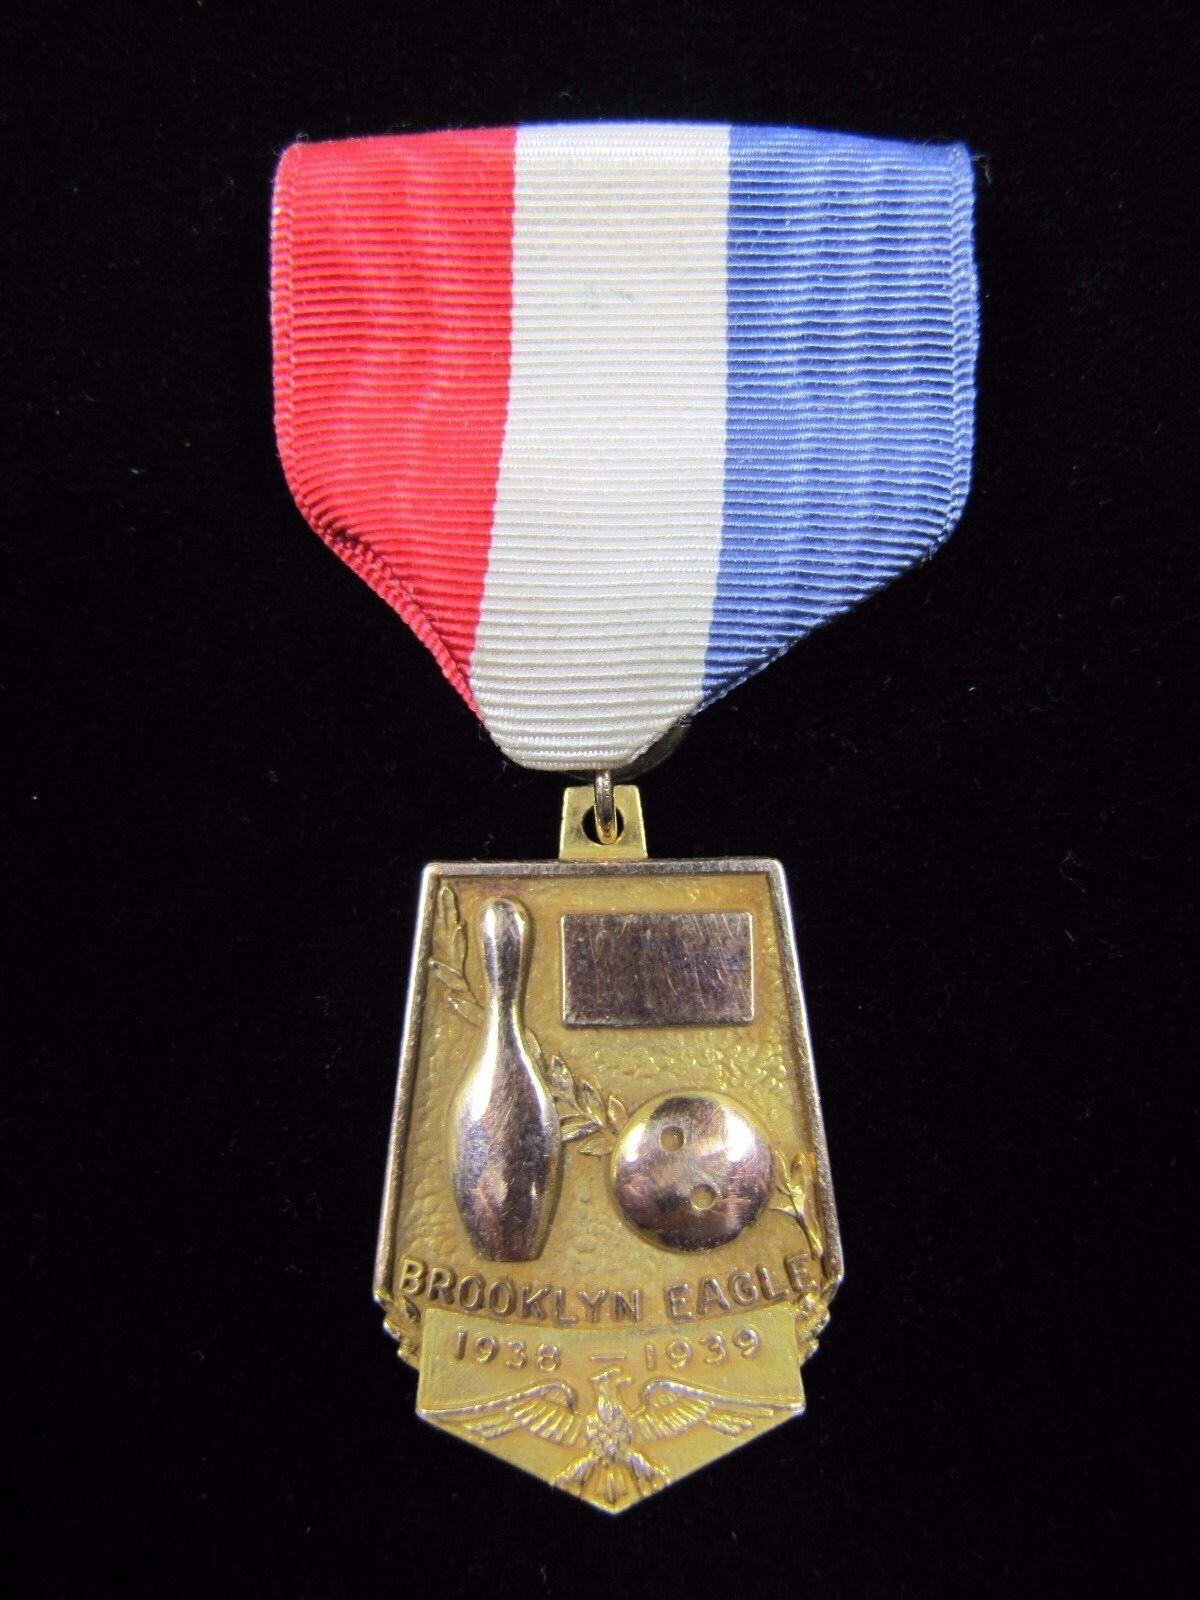 1938-1939 BROOKLYN EAGLE BOWLING Sports 1st PLACE Medallion XX GREEN LANTERN BB